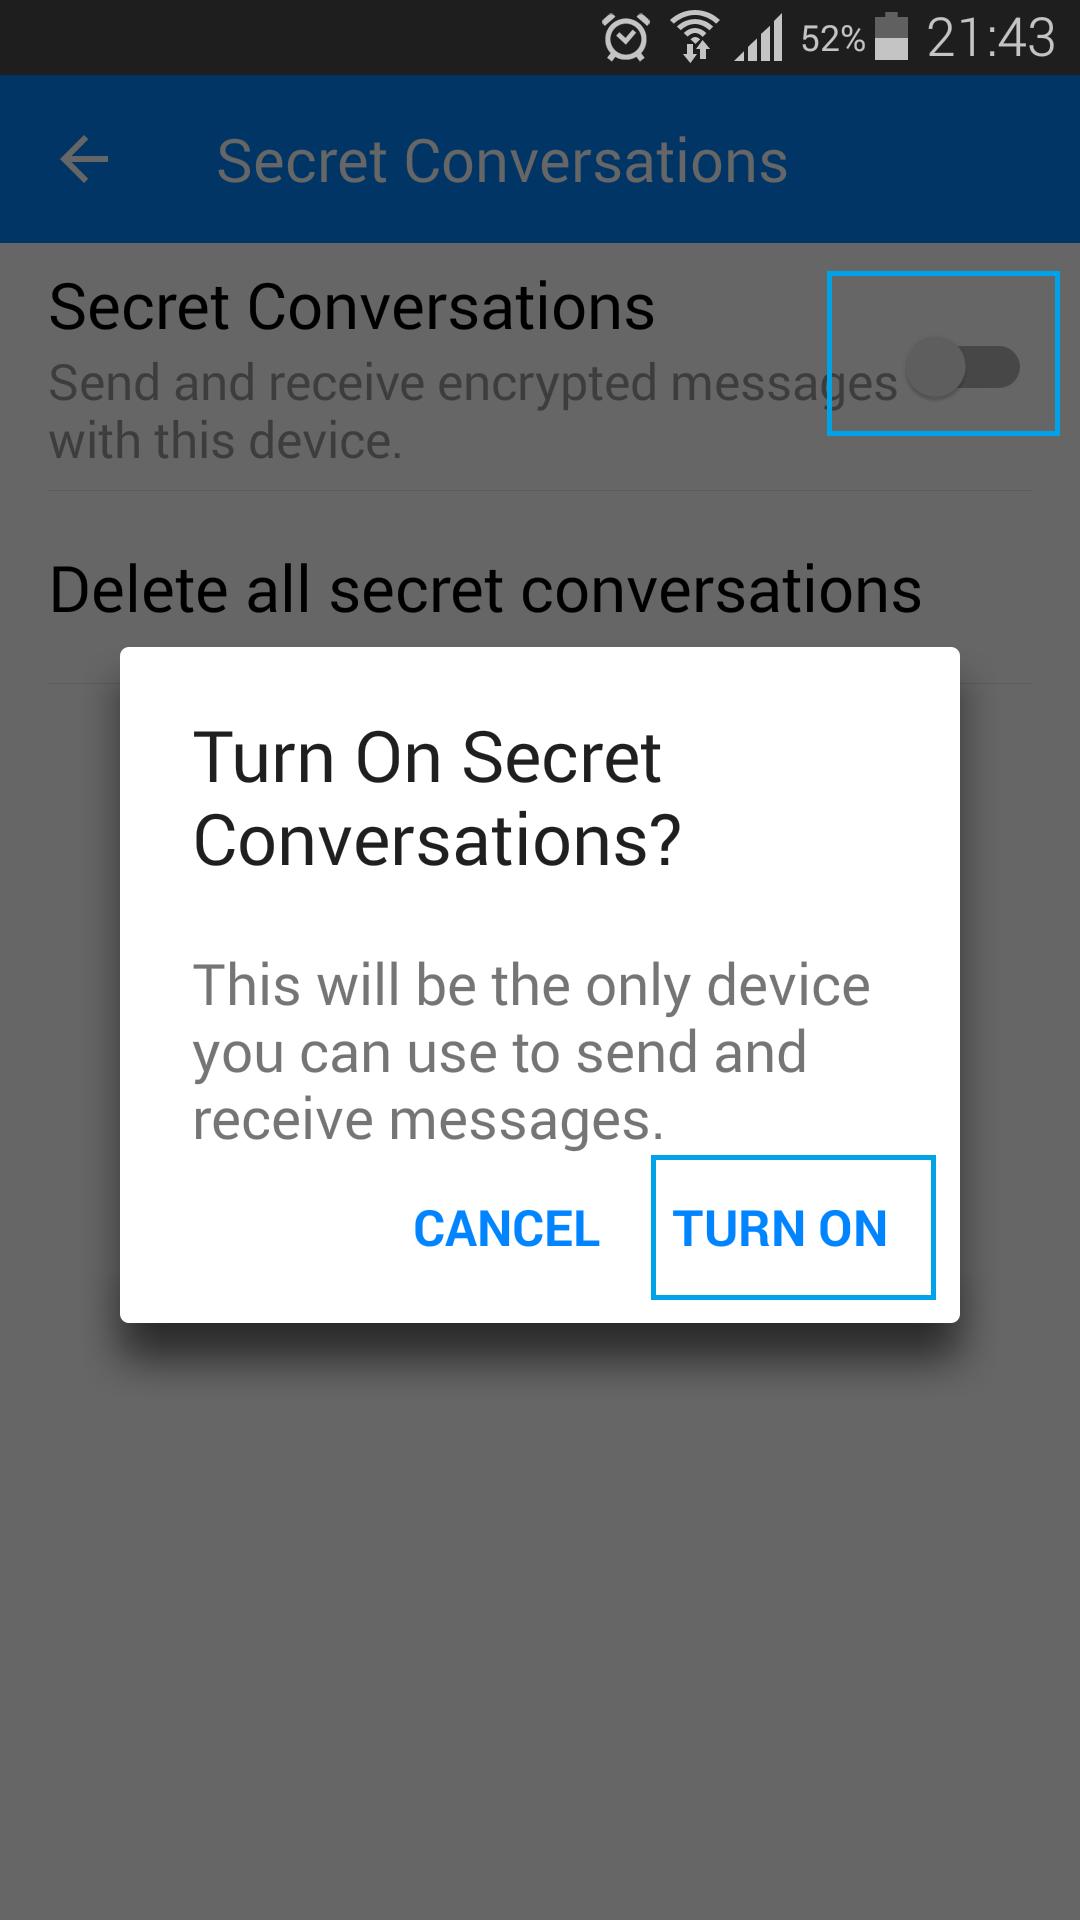 turn on secret conversations